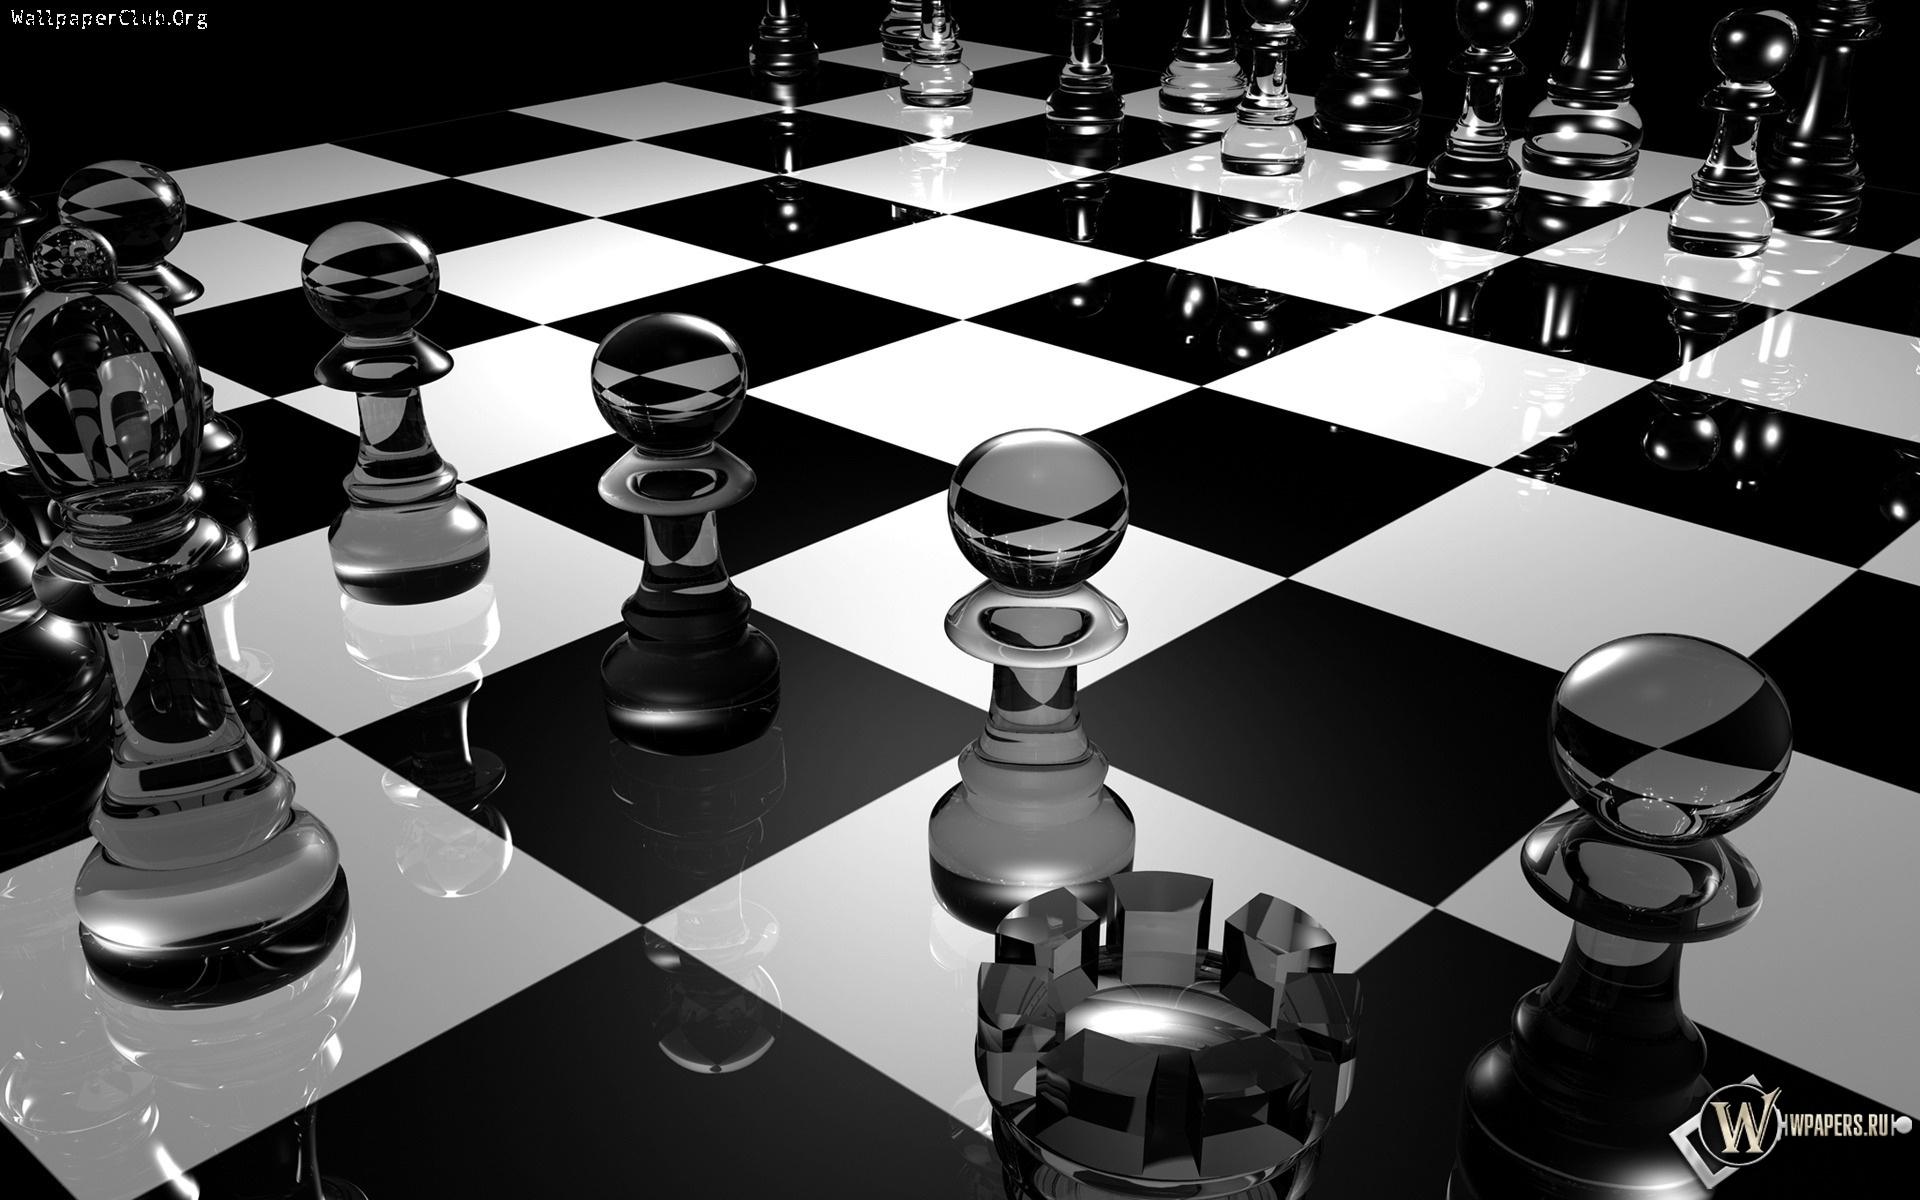 Шахматная доска 1920x1200